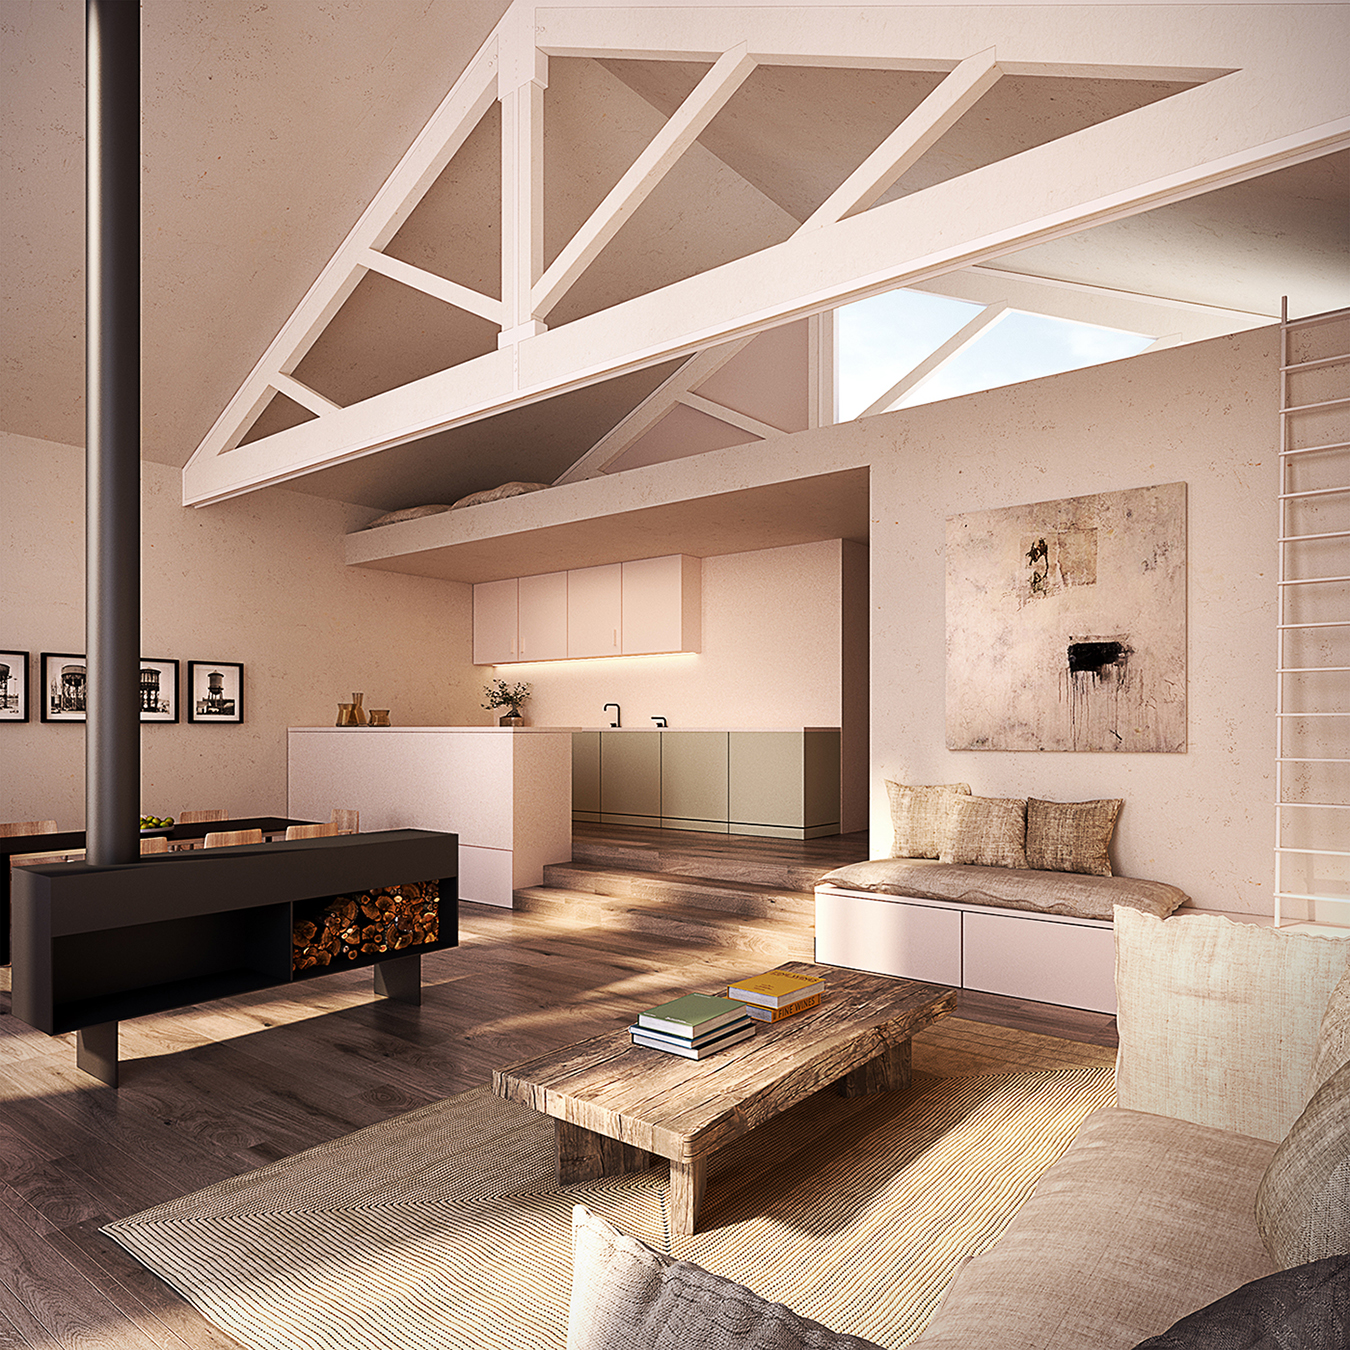 WIT Architects — Loft in Poblenou, Barcelona (ES)